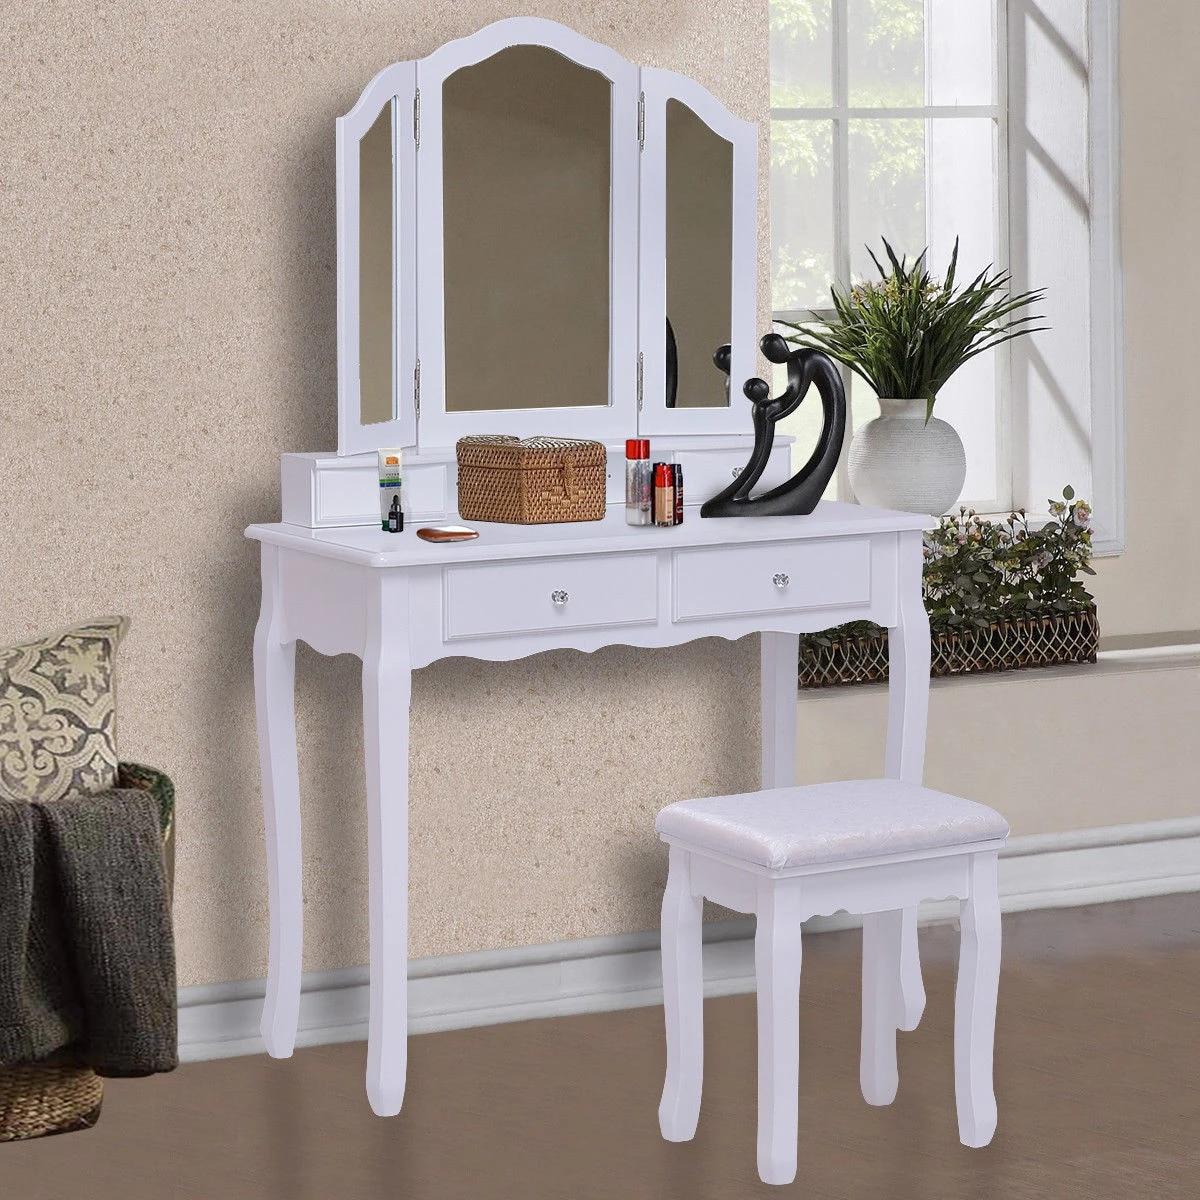 Giantex White Tri Folding Mirror Vanity Makeup Table Stool Set Home Desk With 4 Drawers Bedroom Modern Dresser Hw55563wh Vanity Makeup Tables White Makeup Deskvanity Table Sets Aliexpress